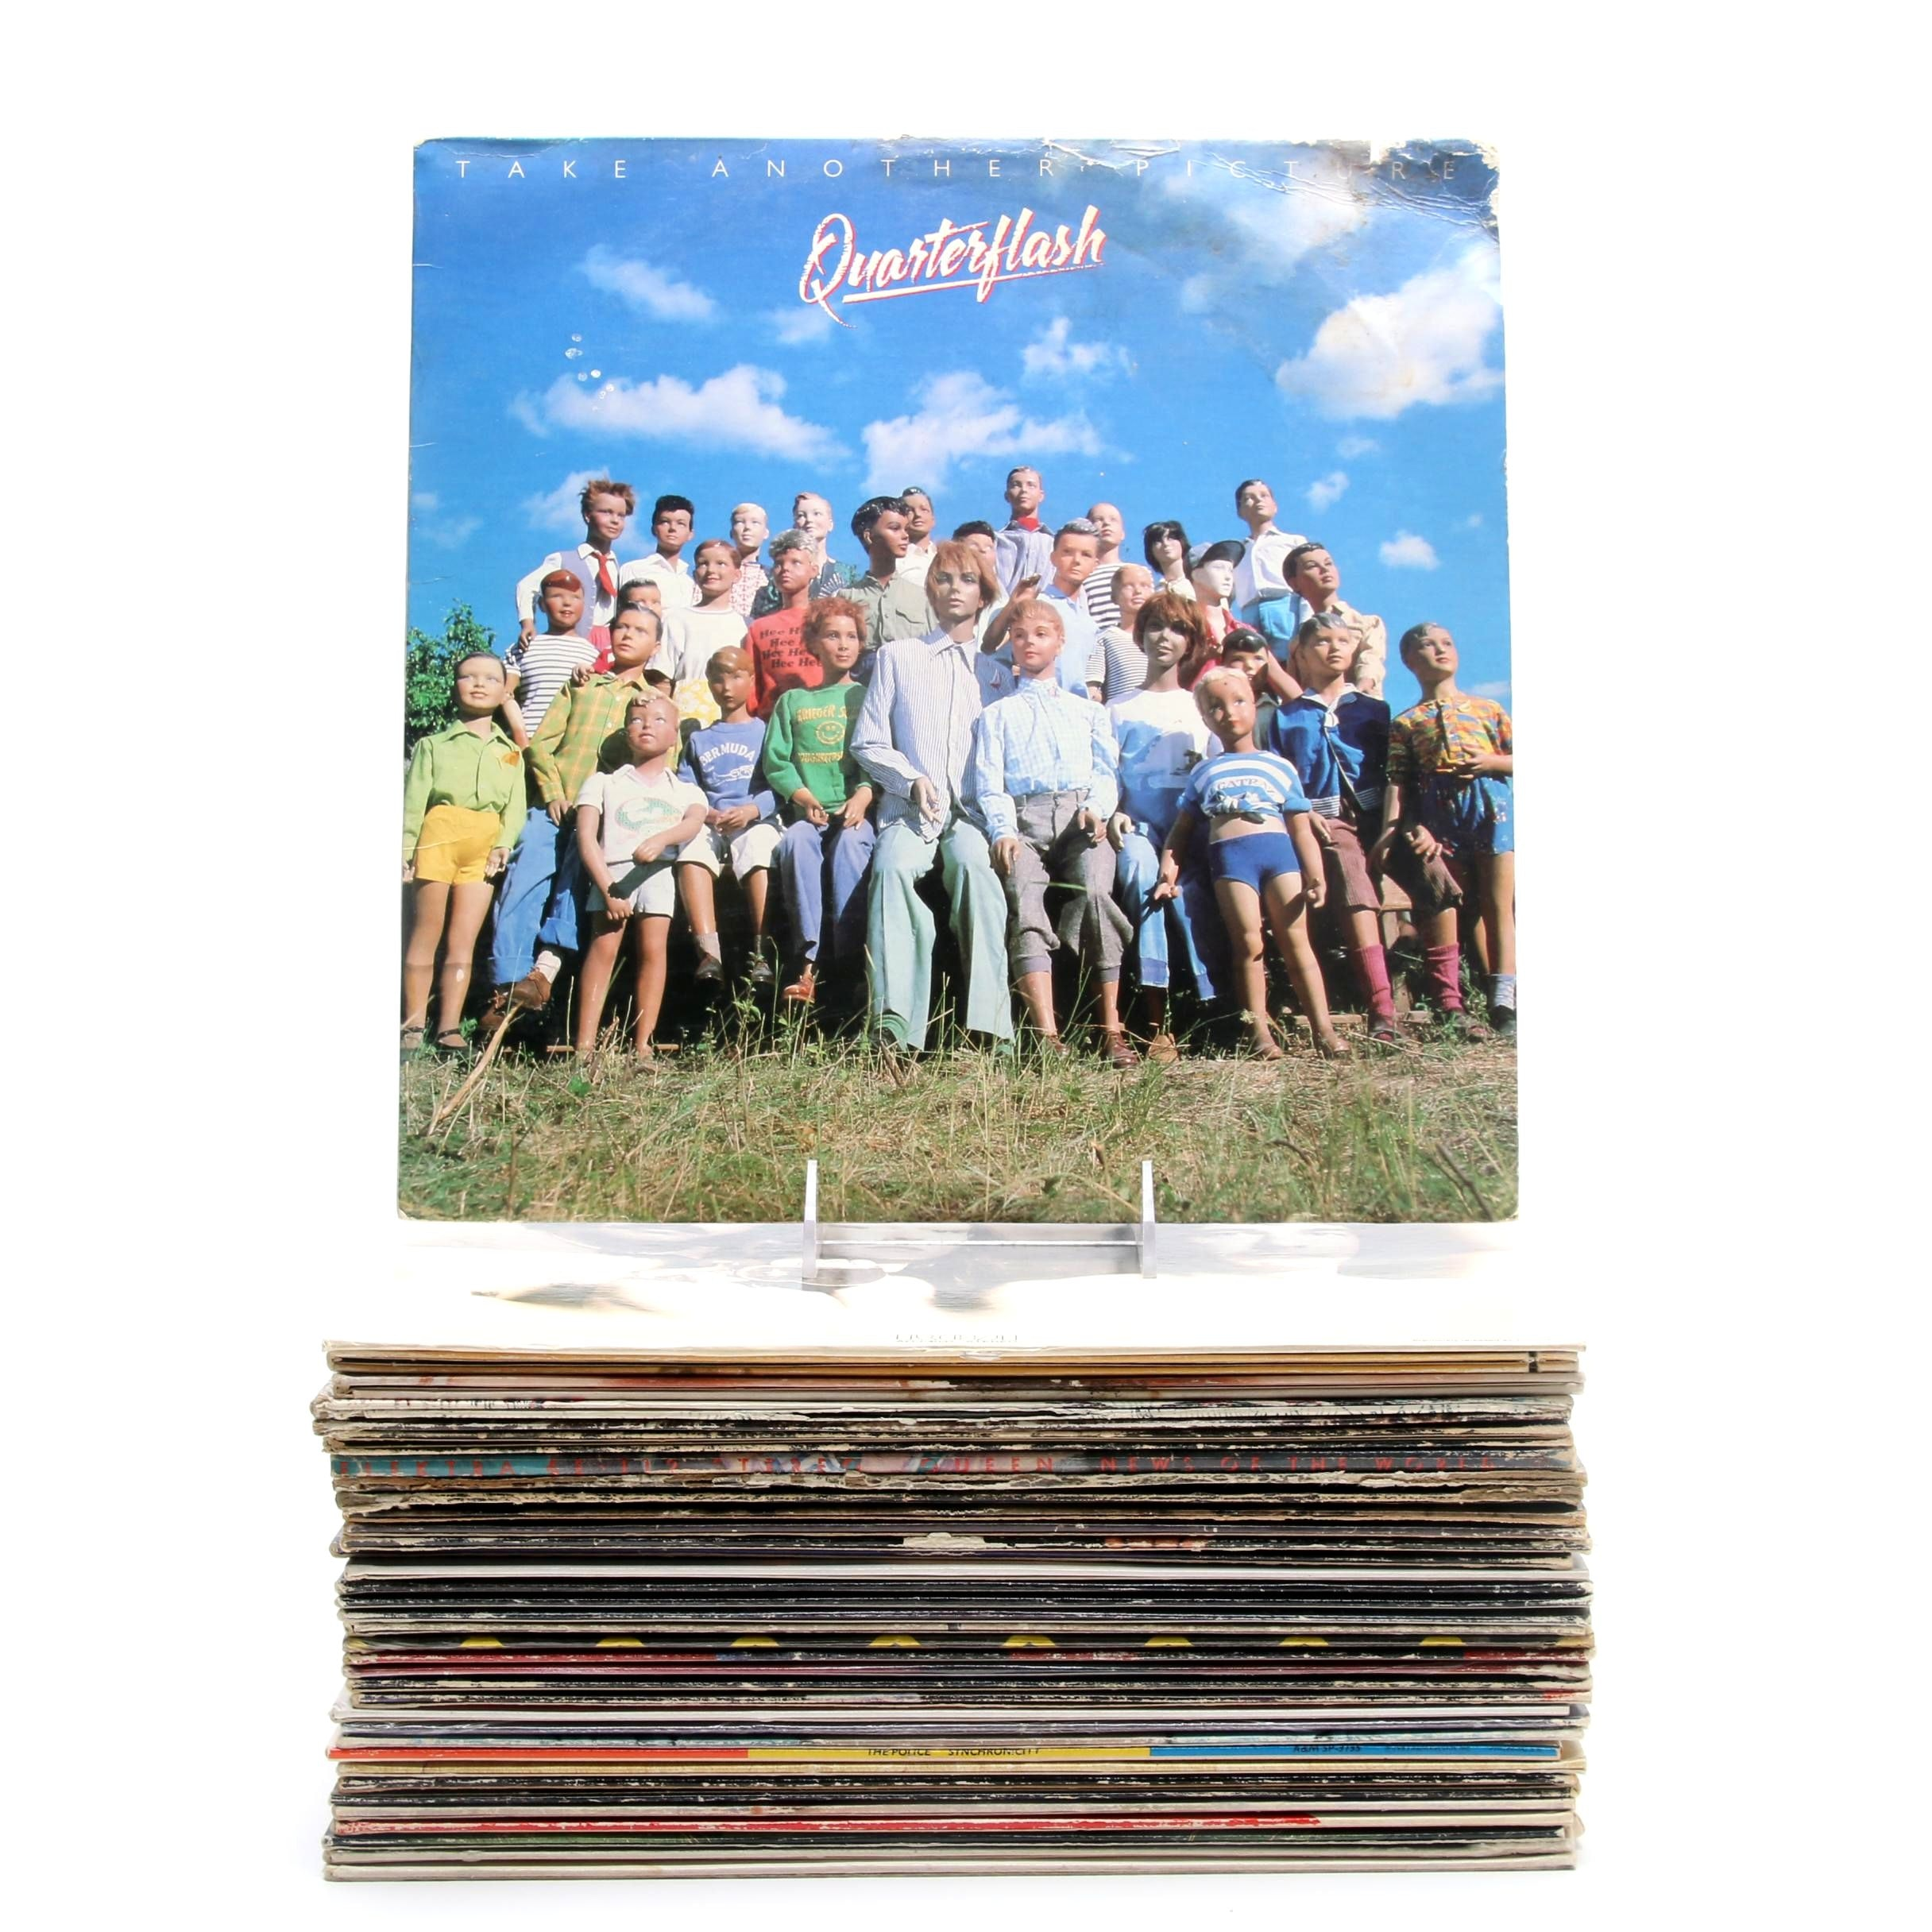 Rock and Pop Vinyl Records Including The Police and Van Halen